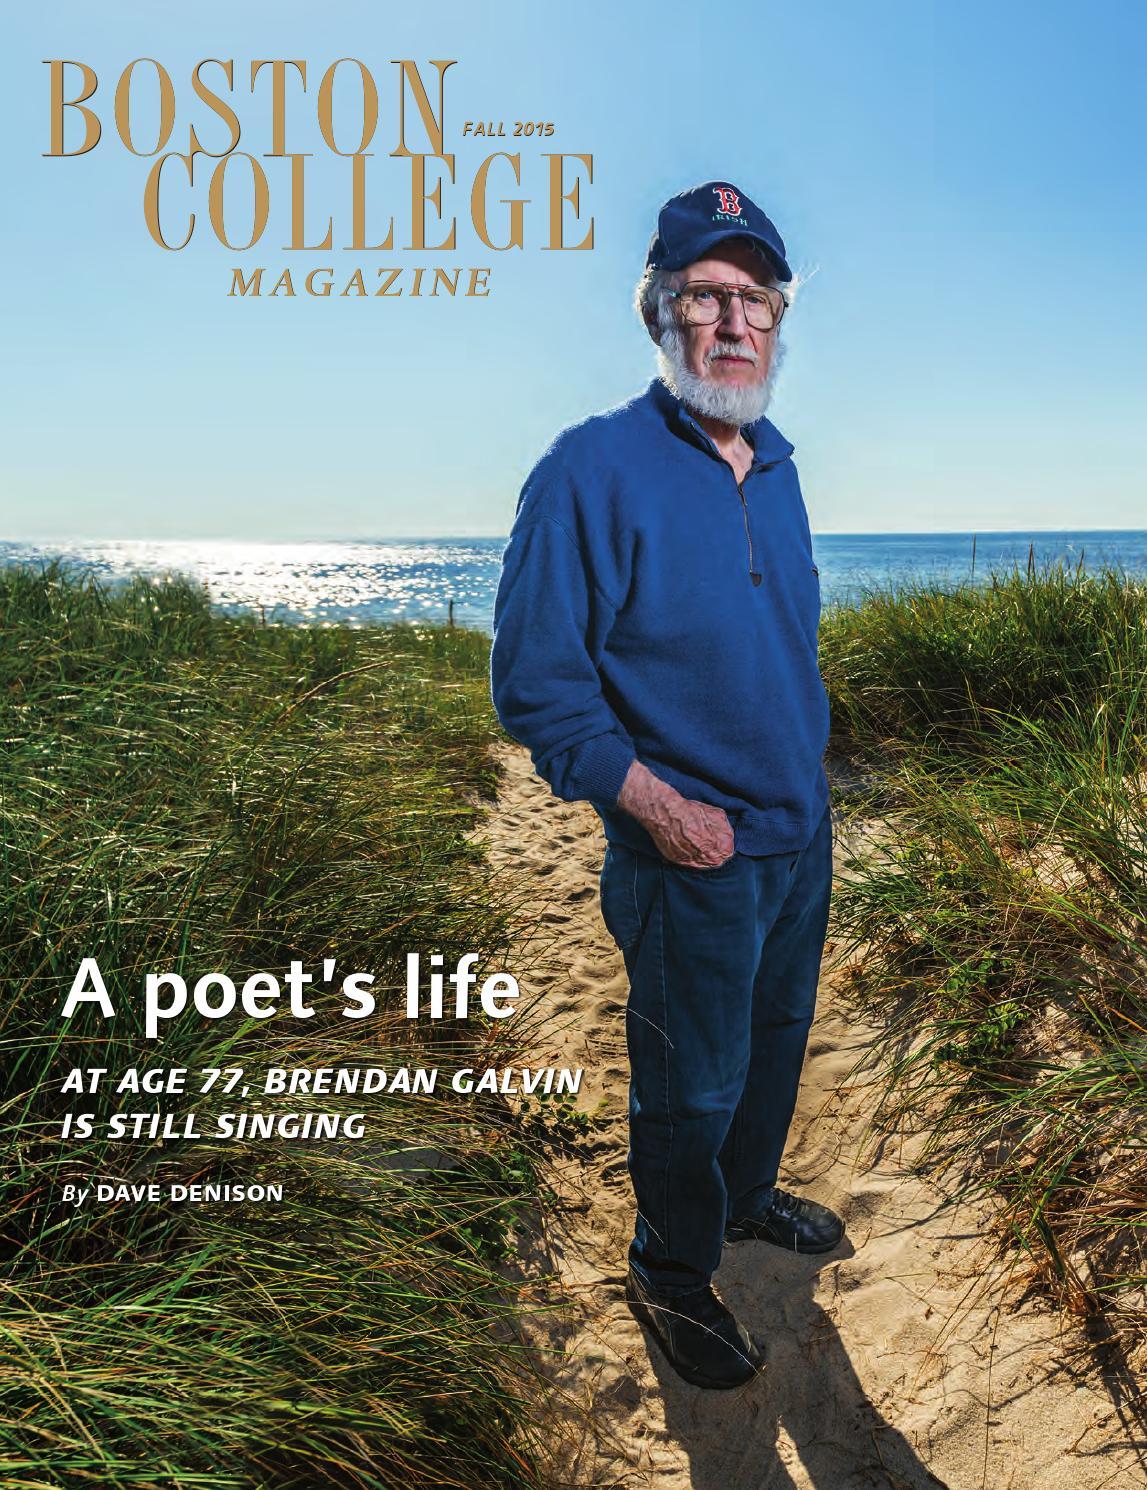 Boston College Magazine, Fall 2015 by Boston College - issuu